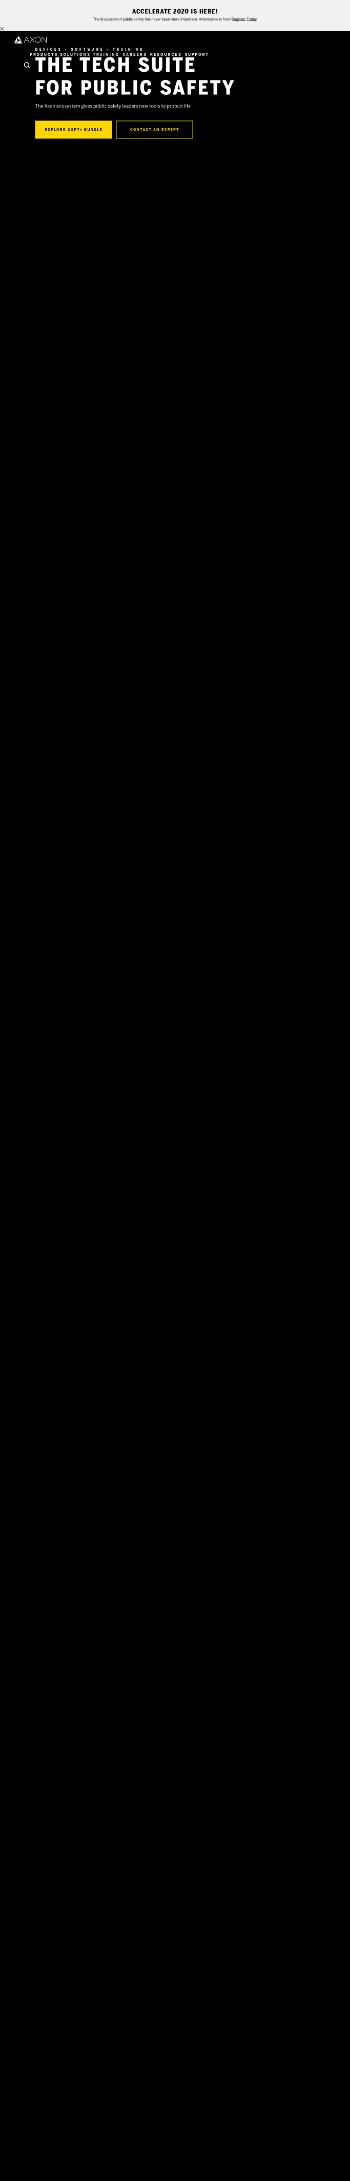 Axon Enterprise, Inc. Website Screenshot